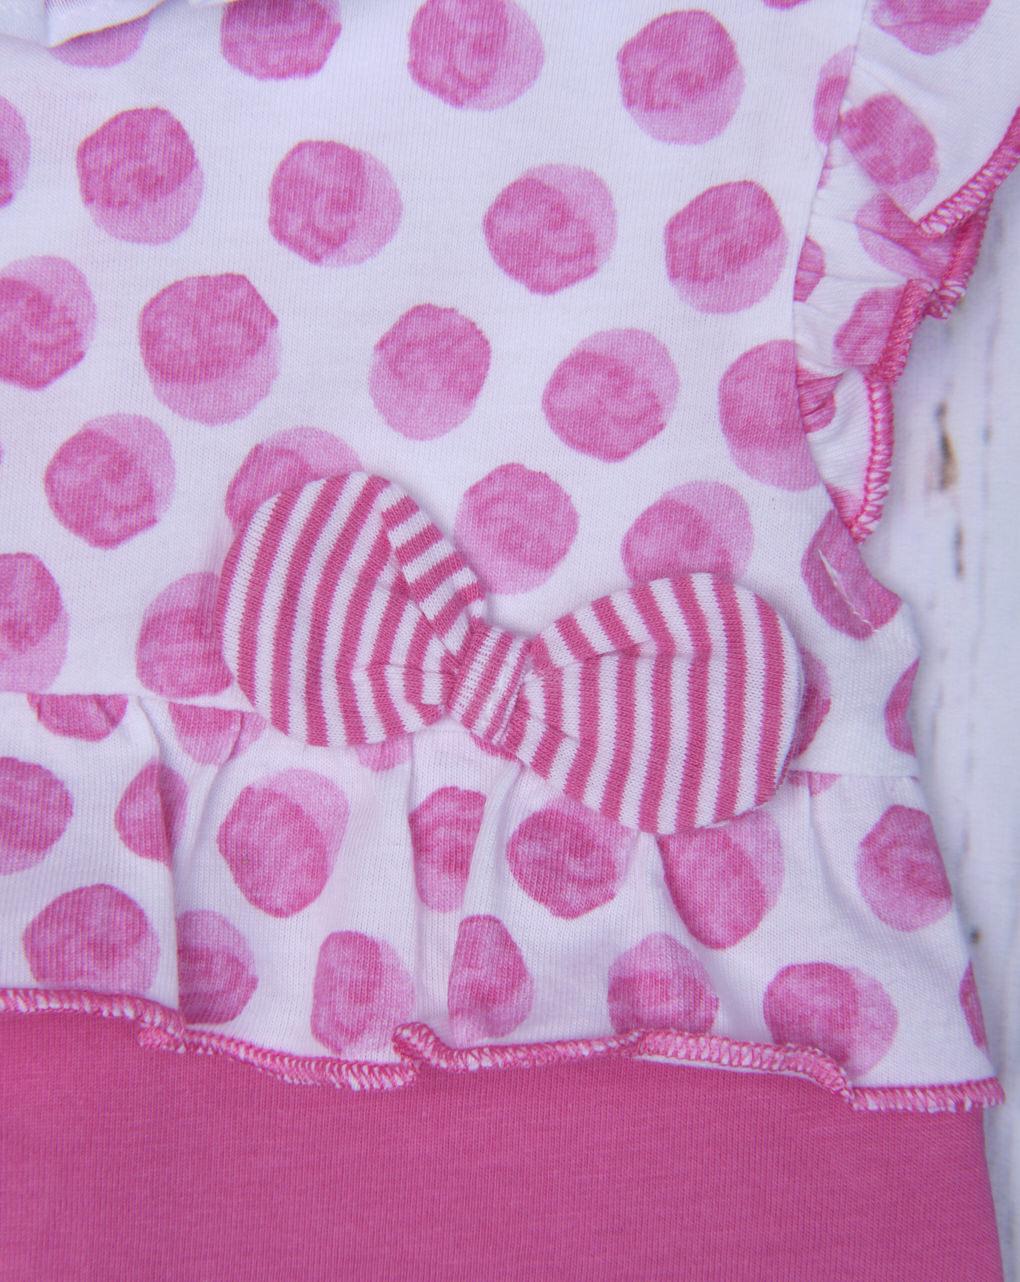 Pagliaccetto jersey bicolor a pois - Essential by Prénatal